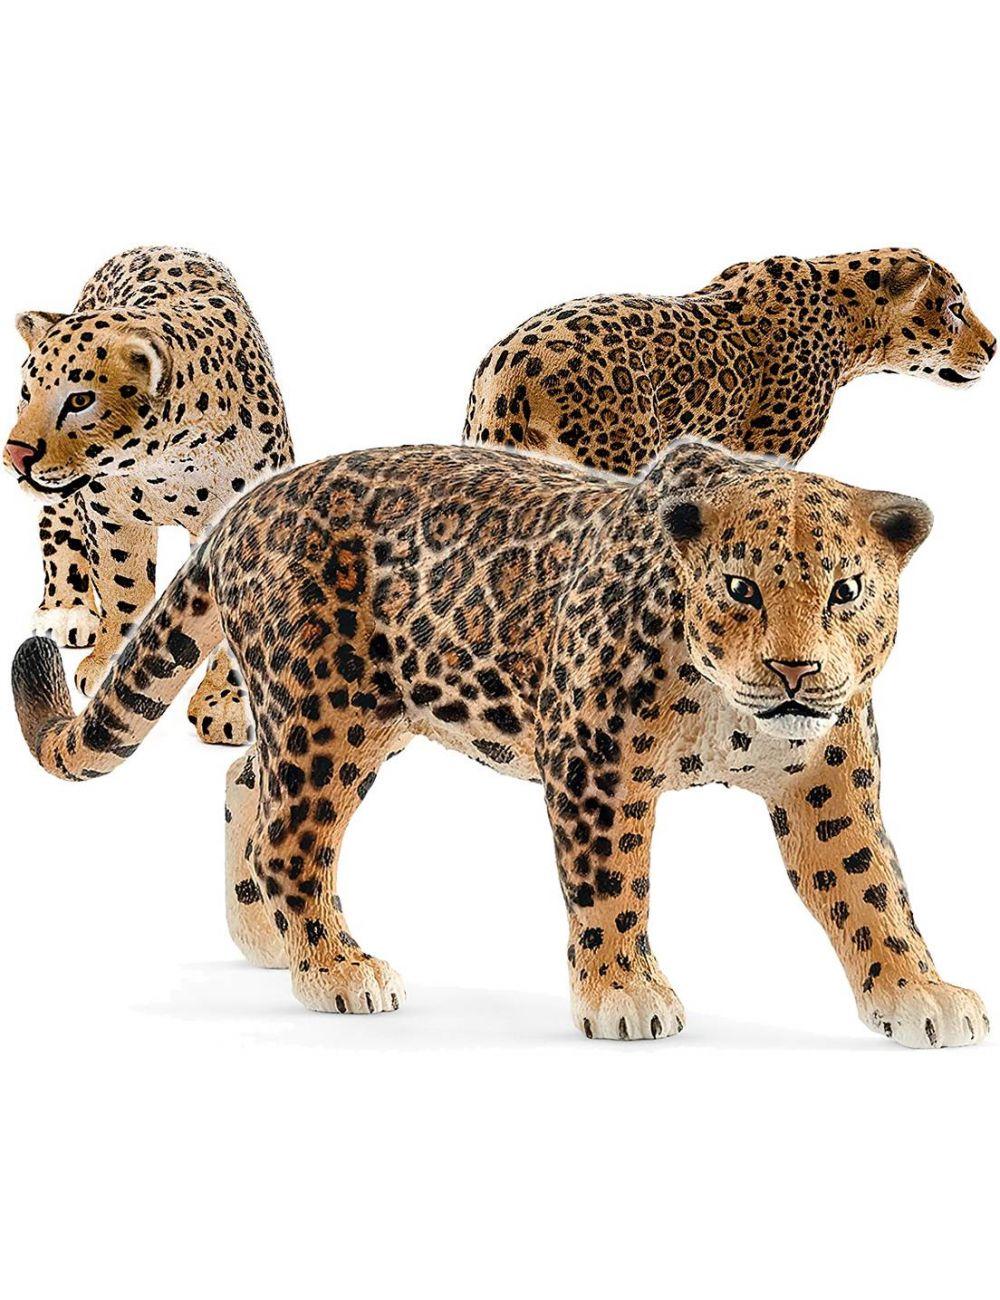 Schleich 14769 Jaguar